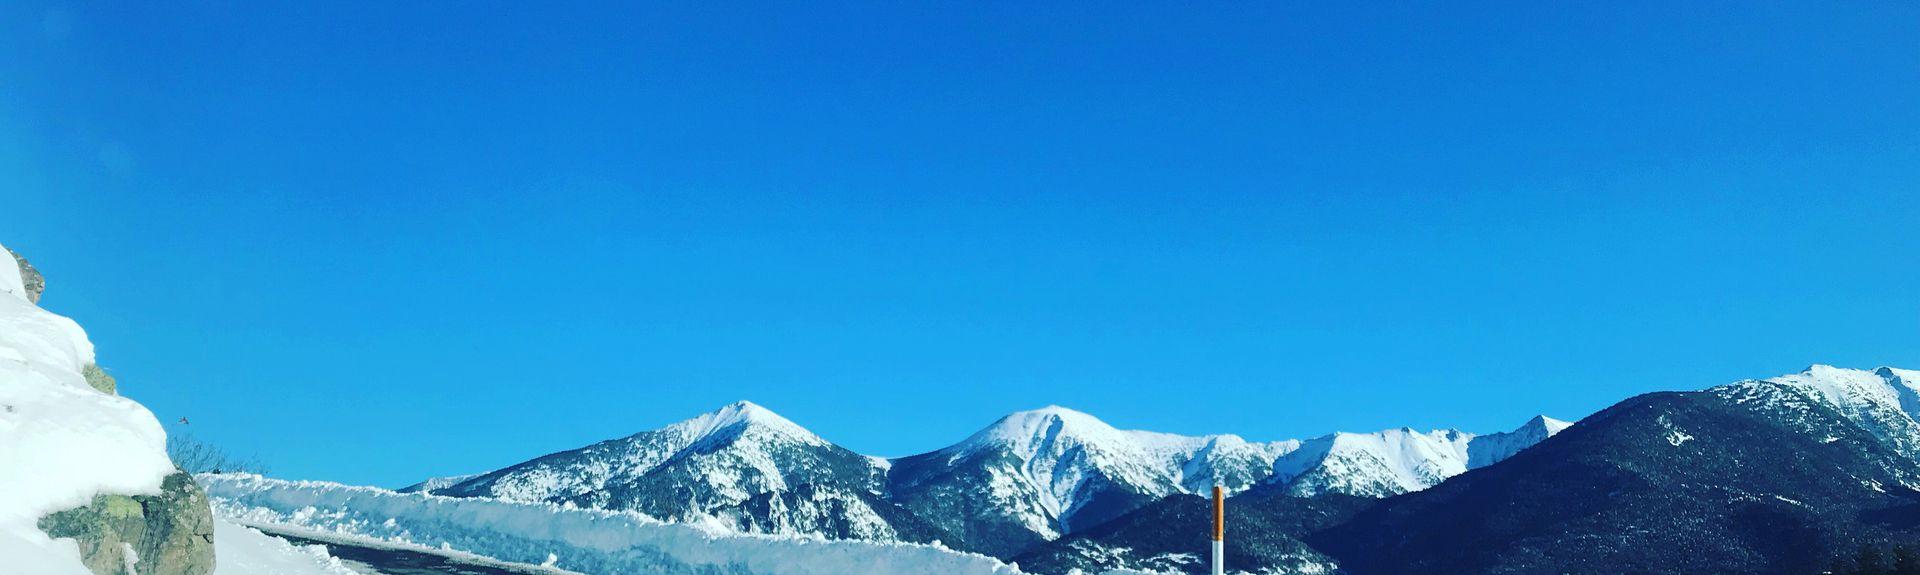 Osseja, Pirineos Orientales, Francia